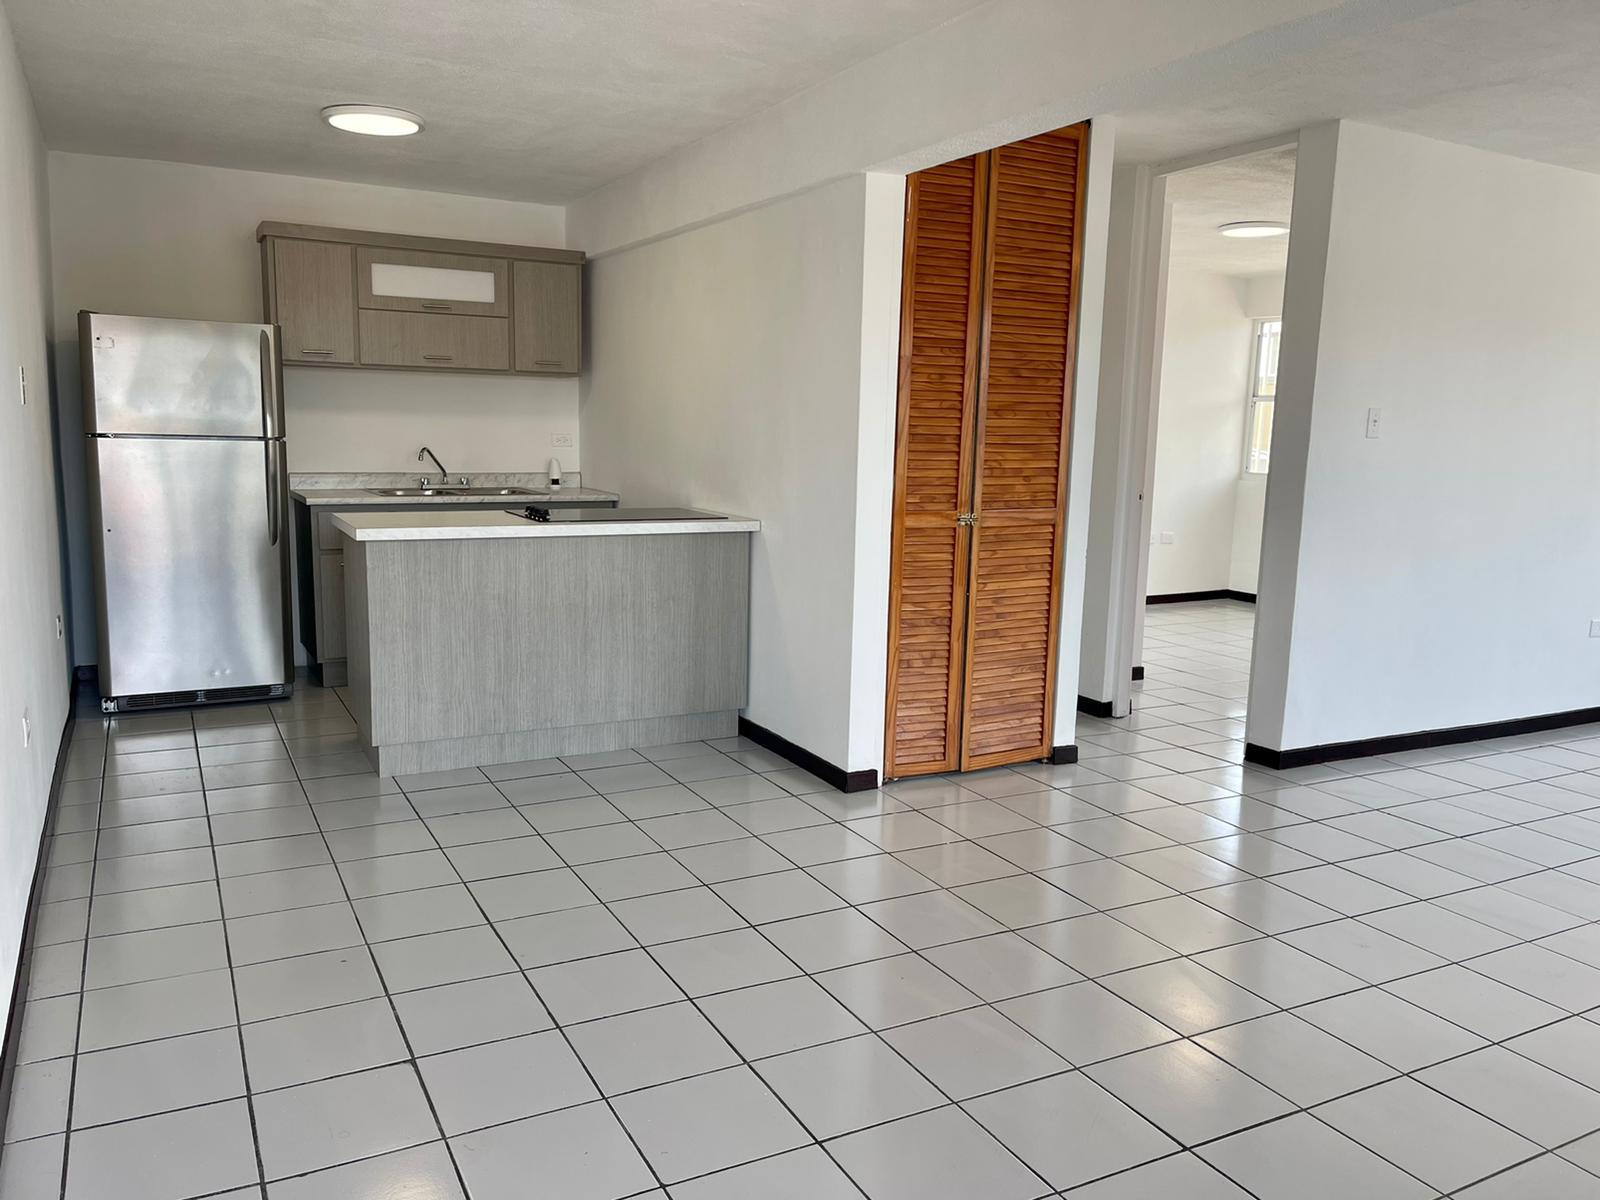 Kitchen from the front door.